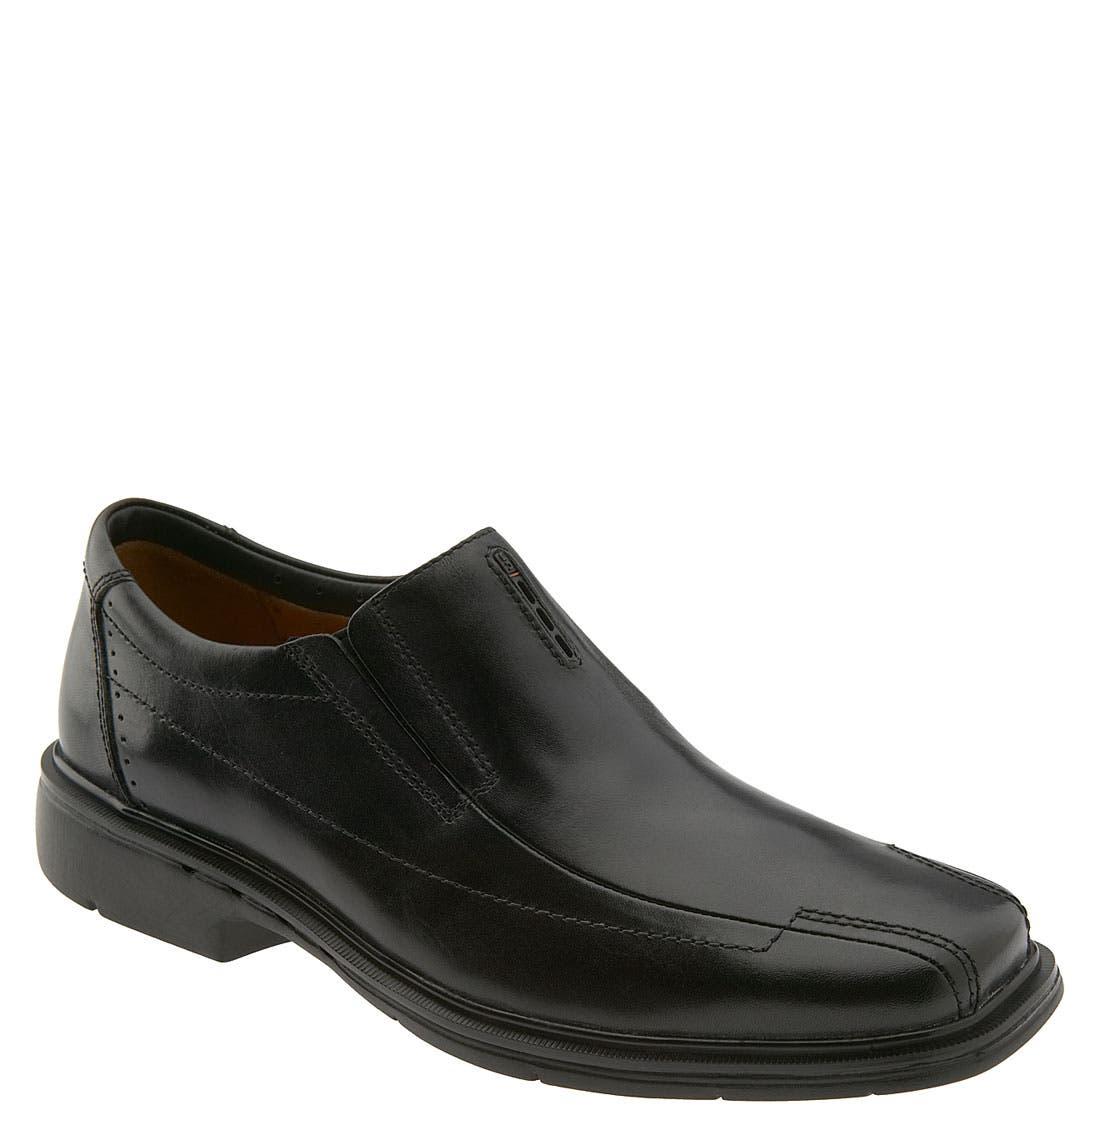 'Un.Sheridan' Slip-On,                             Main thumbnail 1, color,                             Black Leather